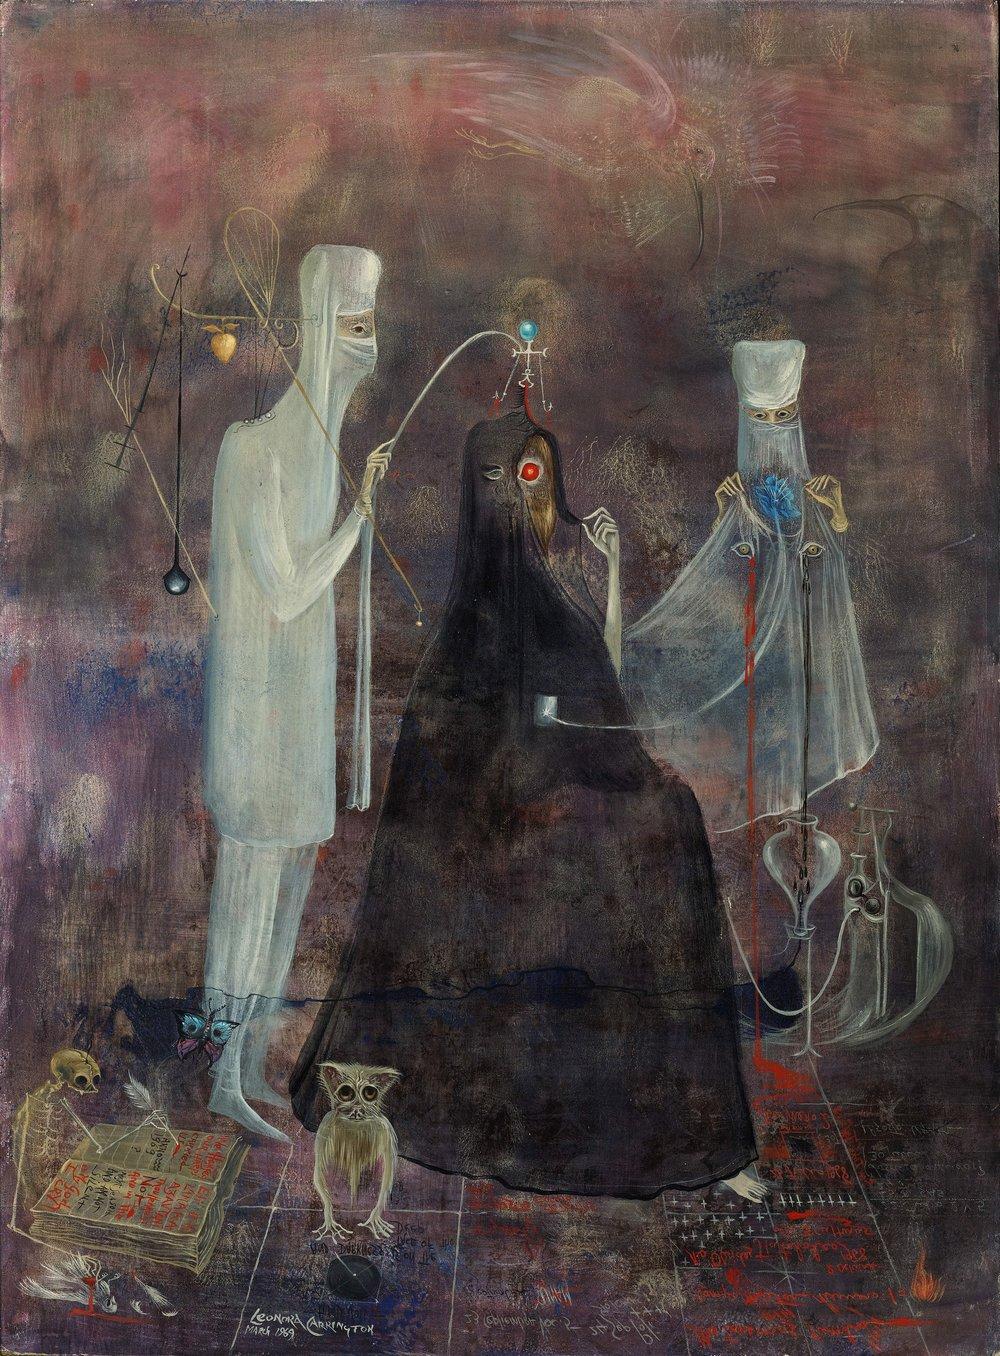 FEATURED MUSEUM EXHIBITION   Leonora Carrington | Magical Tales   October 11, 2018 — February 3, 2019 | Museo de Arte Contemporáneo (MARCO), Monterrey, Mexico